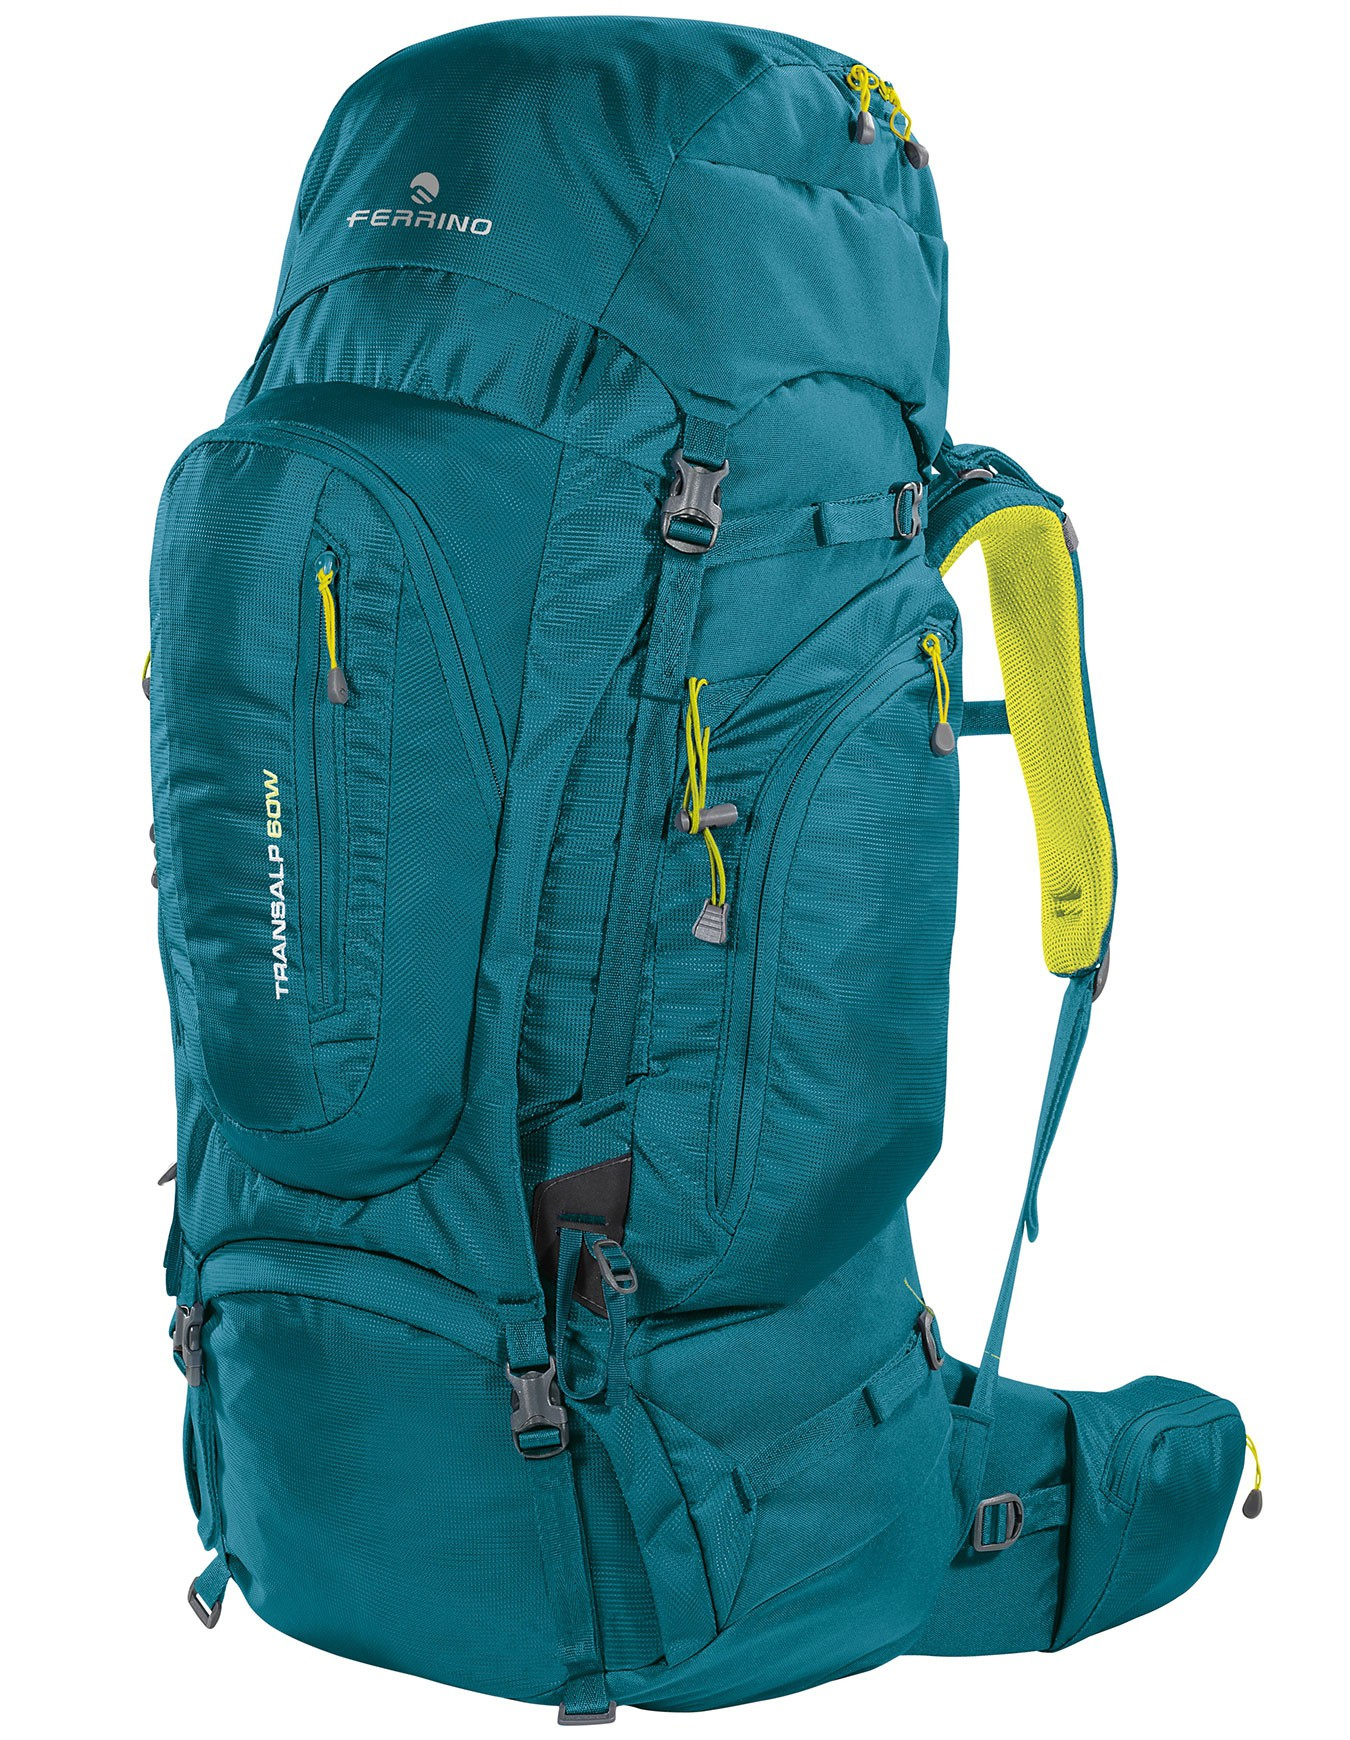 Transalp 60L Lady Ferrino - Sac à dos femme Trekking Randonnée